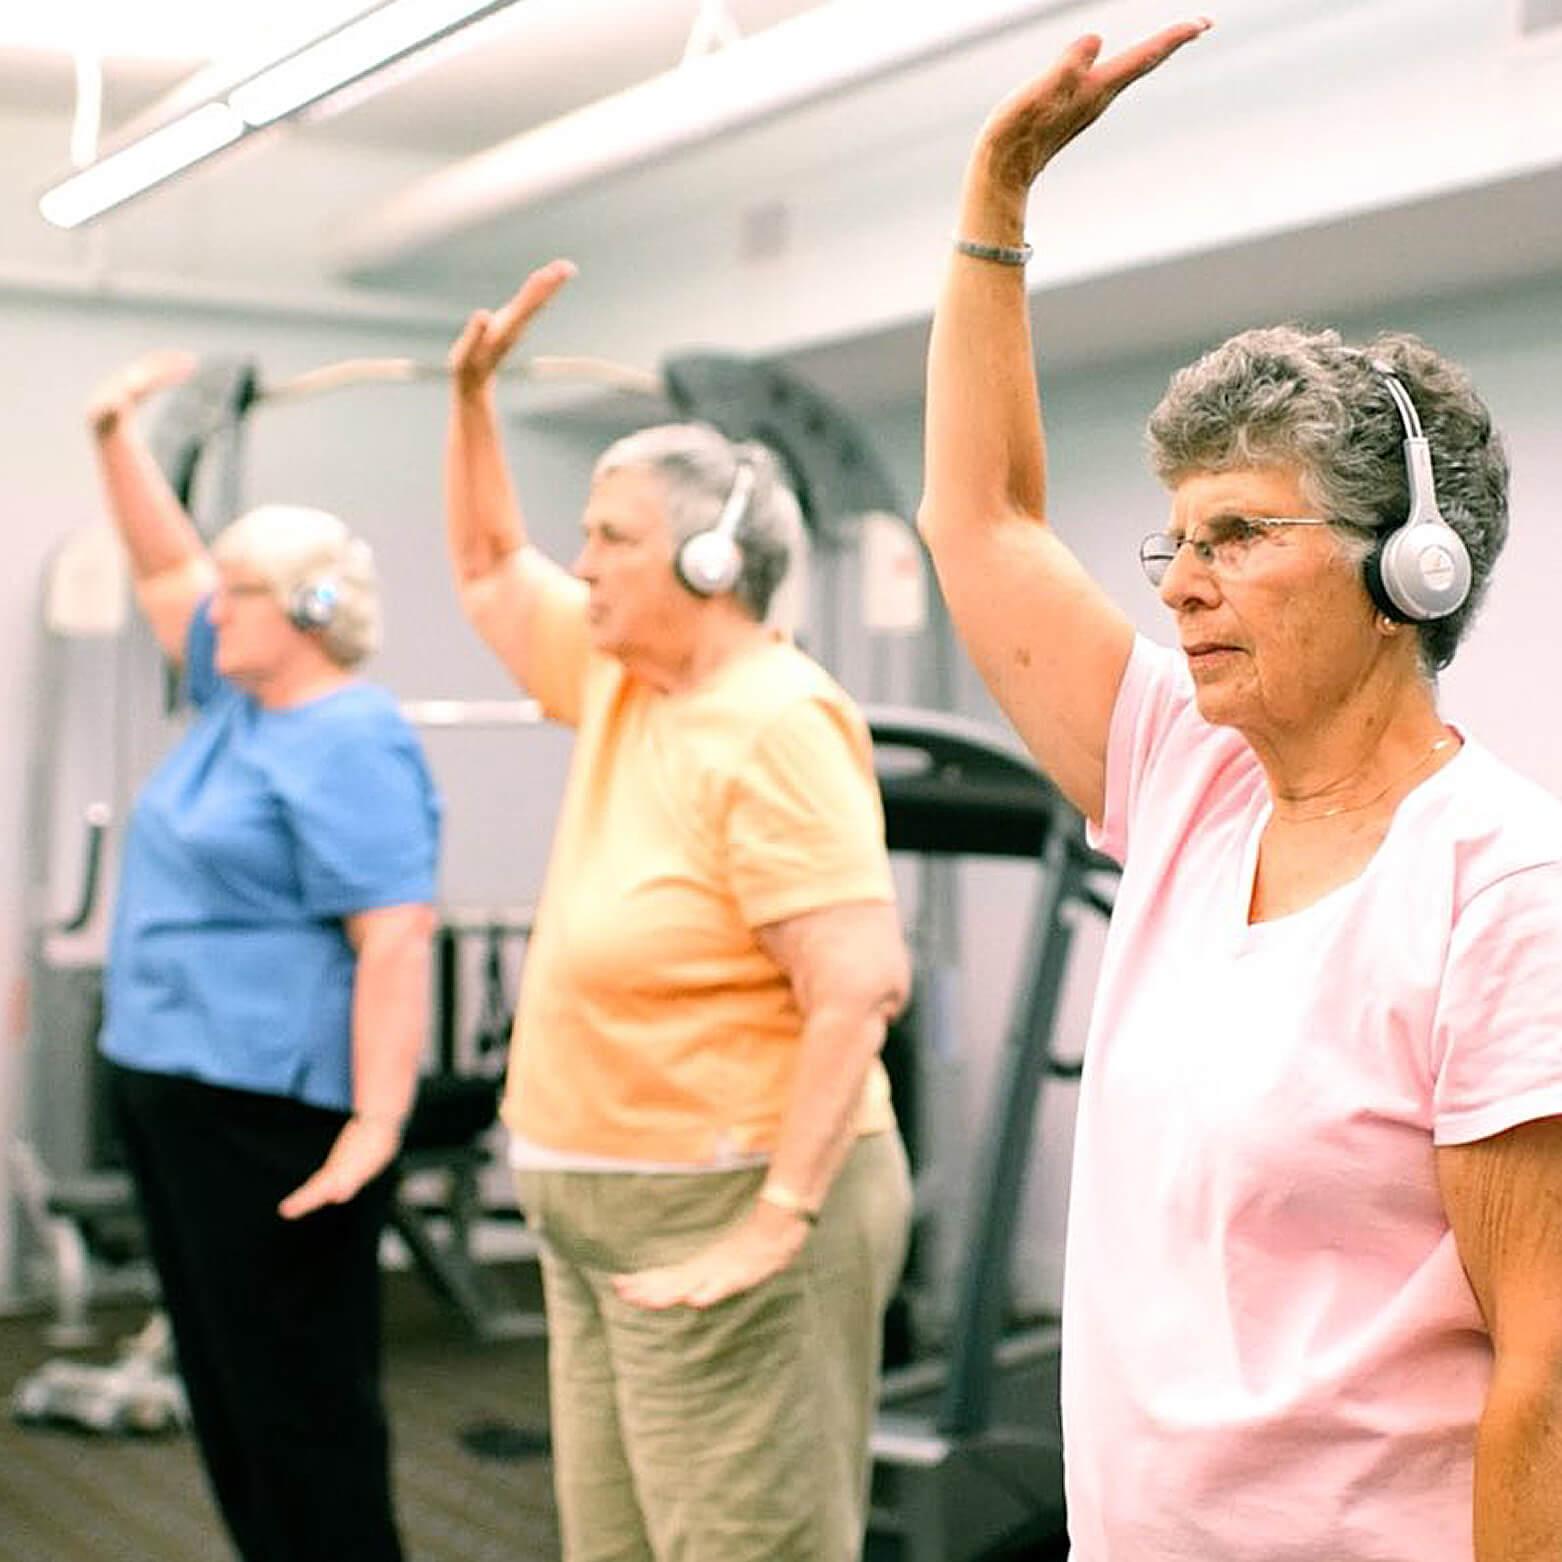 Senior residents doing tiachi yoga using Eversound headphones